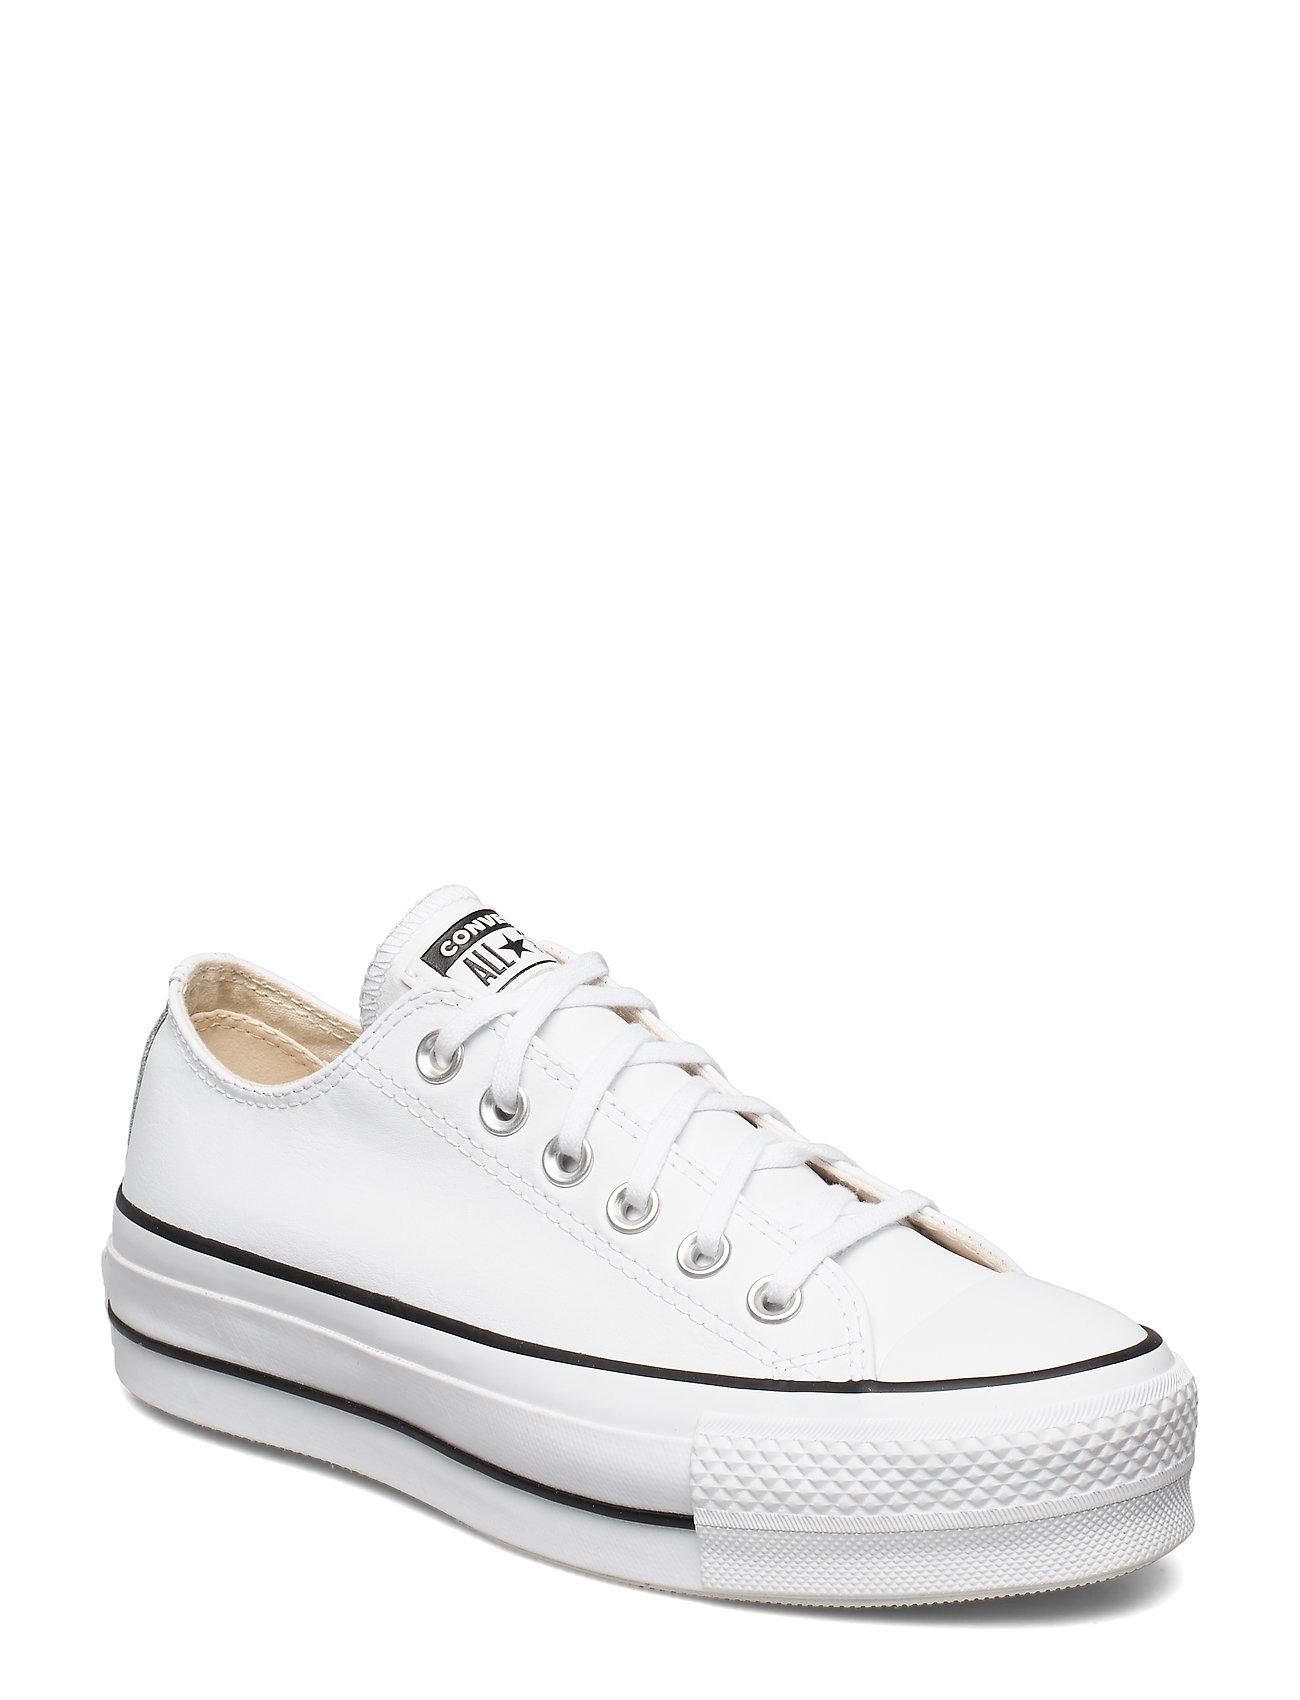 Converse CTAS LIFT CLEAN OX WHITE/BLACK/WHITE - WHITE/BLACK/WHITE